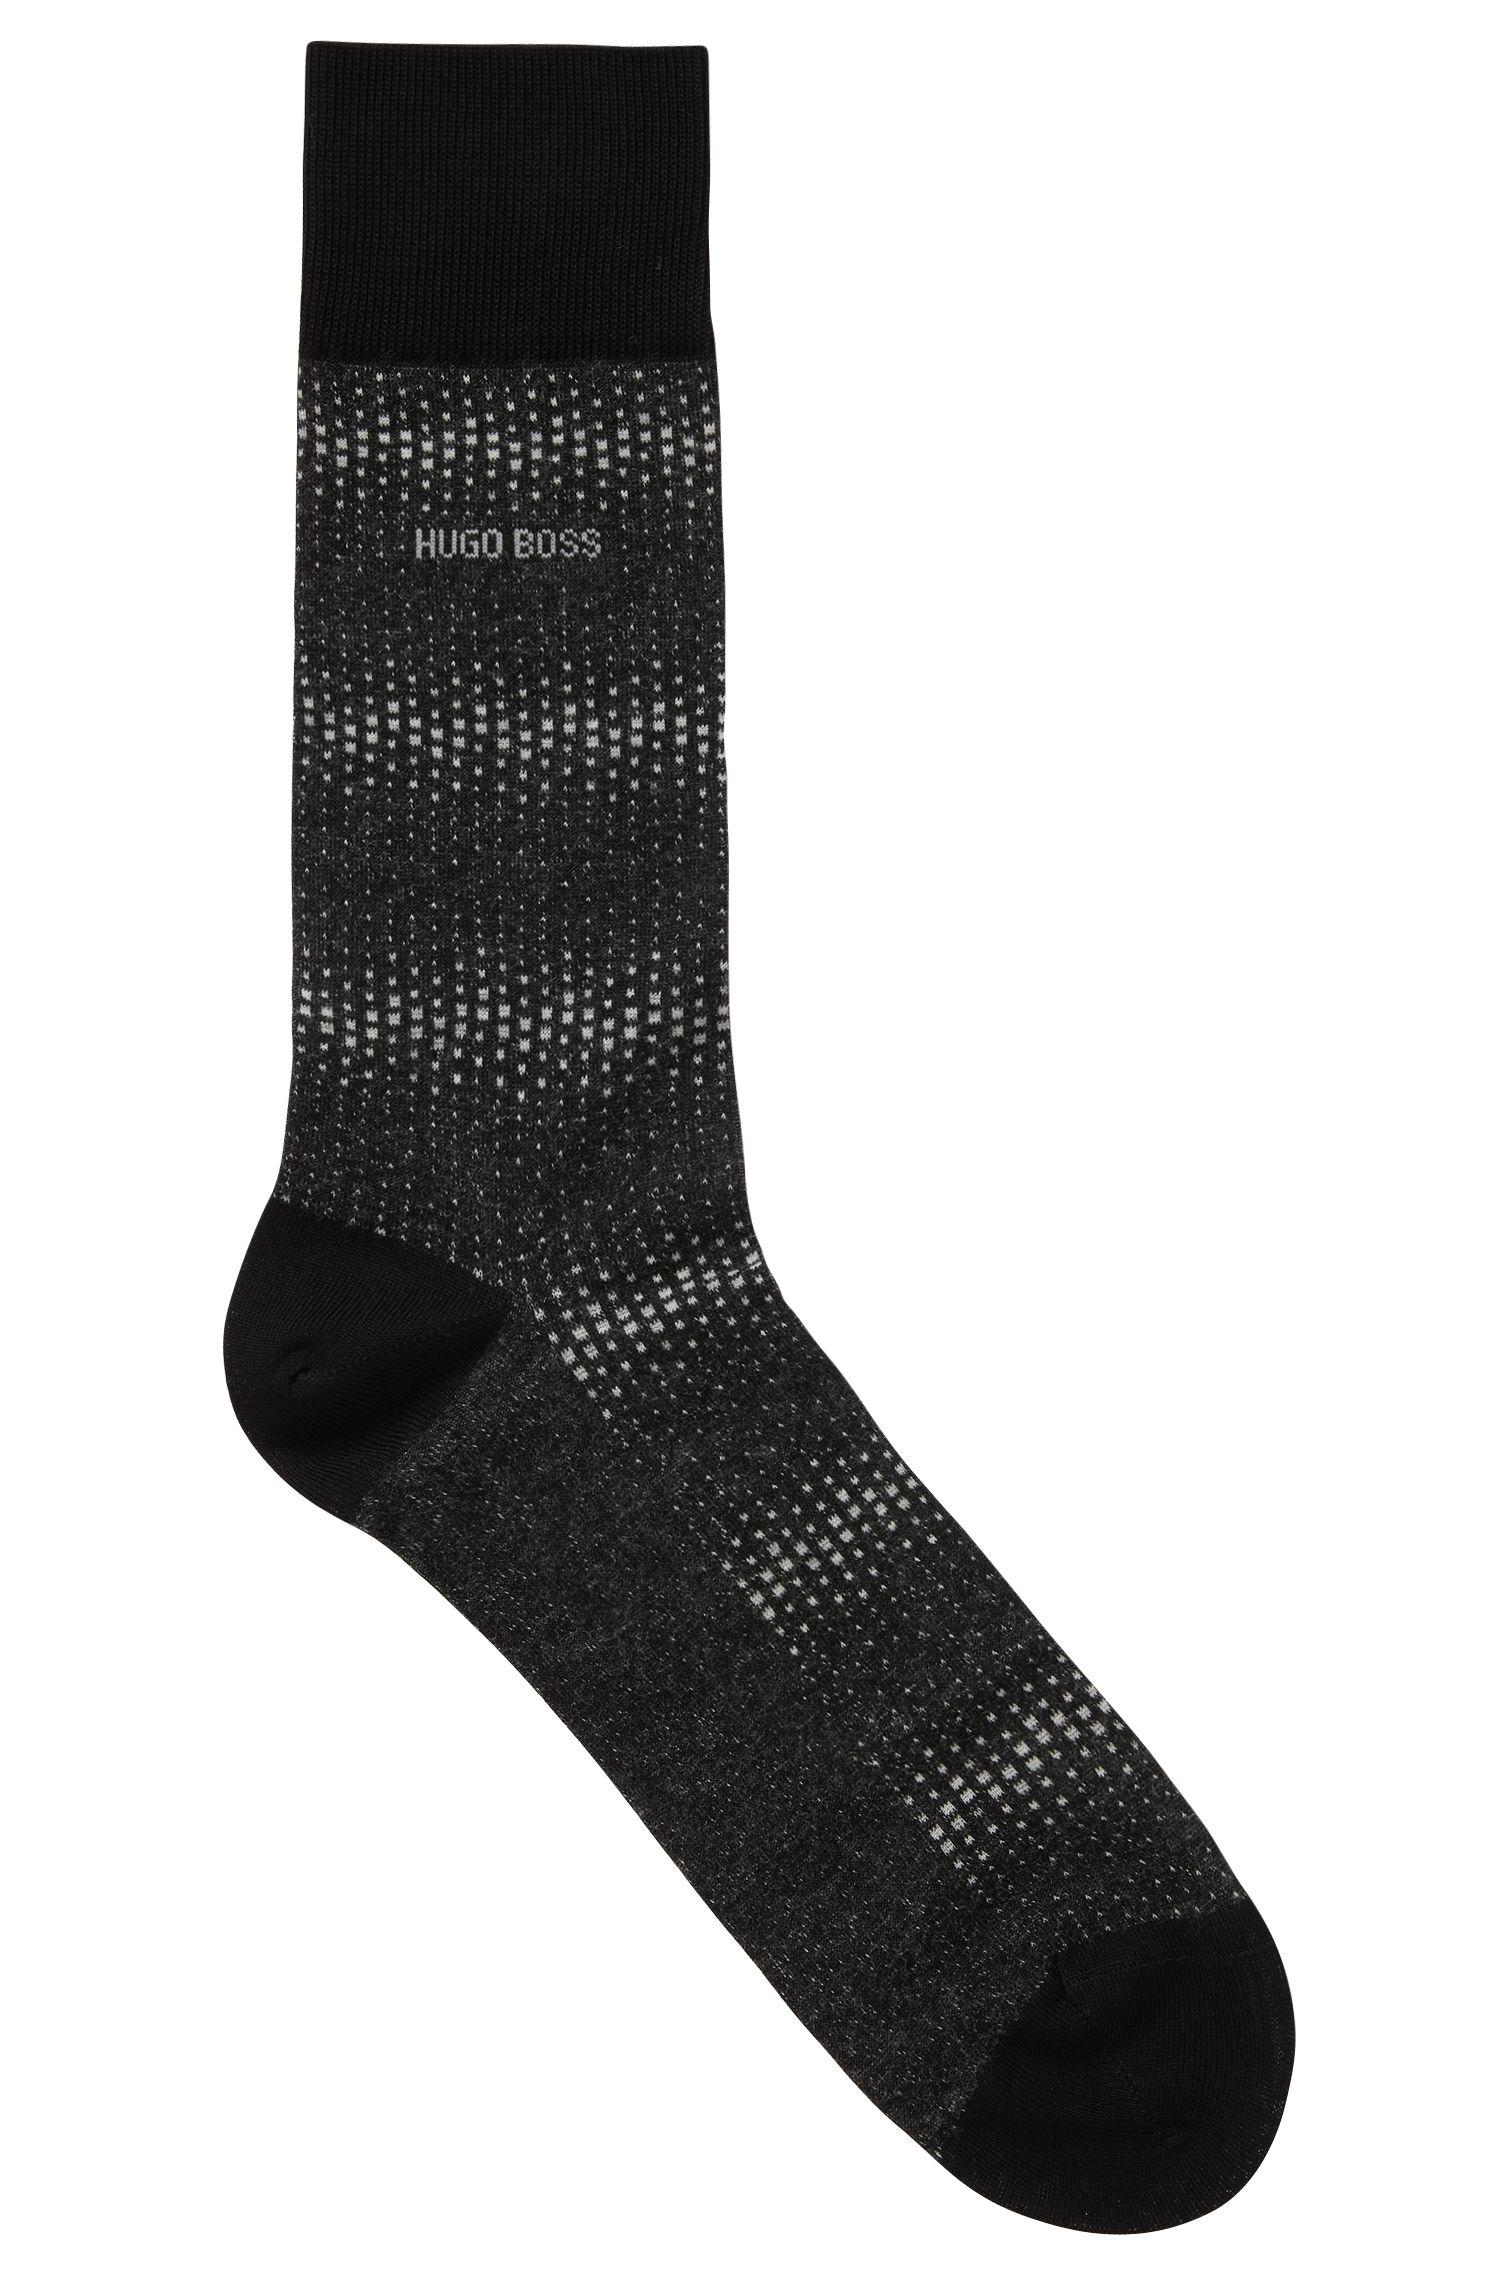 Micro-pattern socks in mercerized stretch cotton